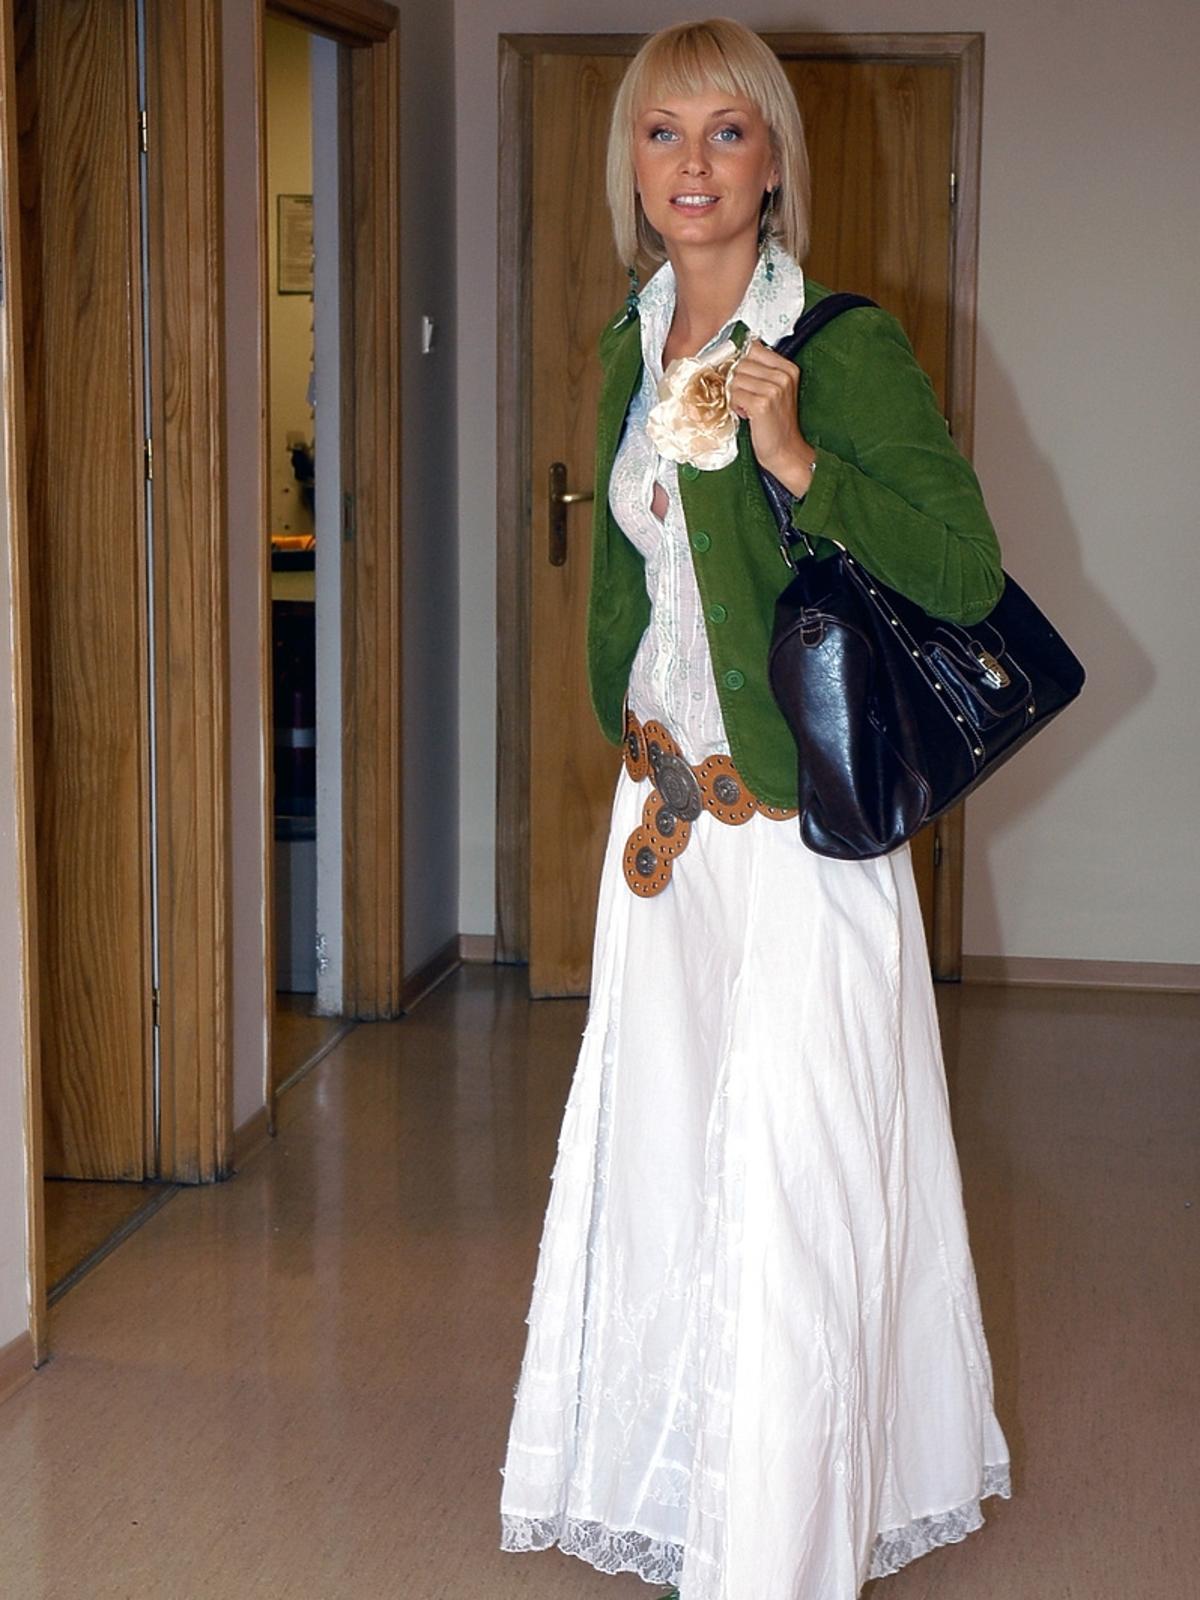 Agnieszka Szulim 10 lat temu